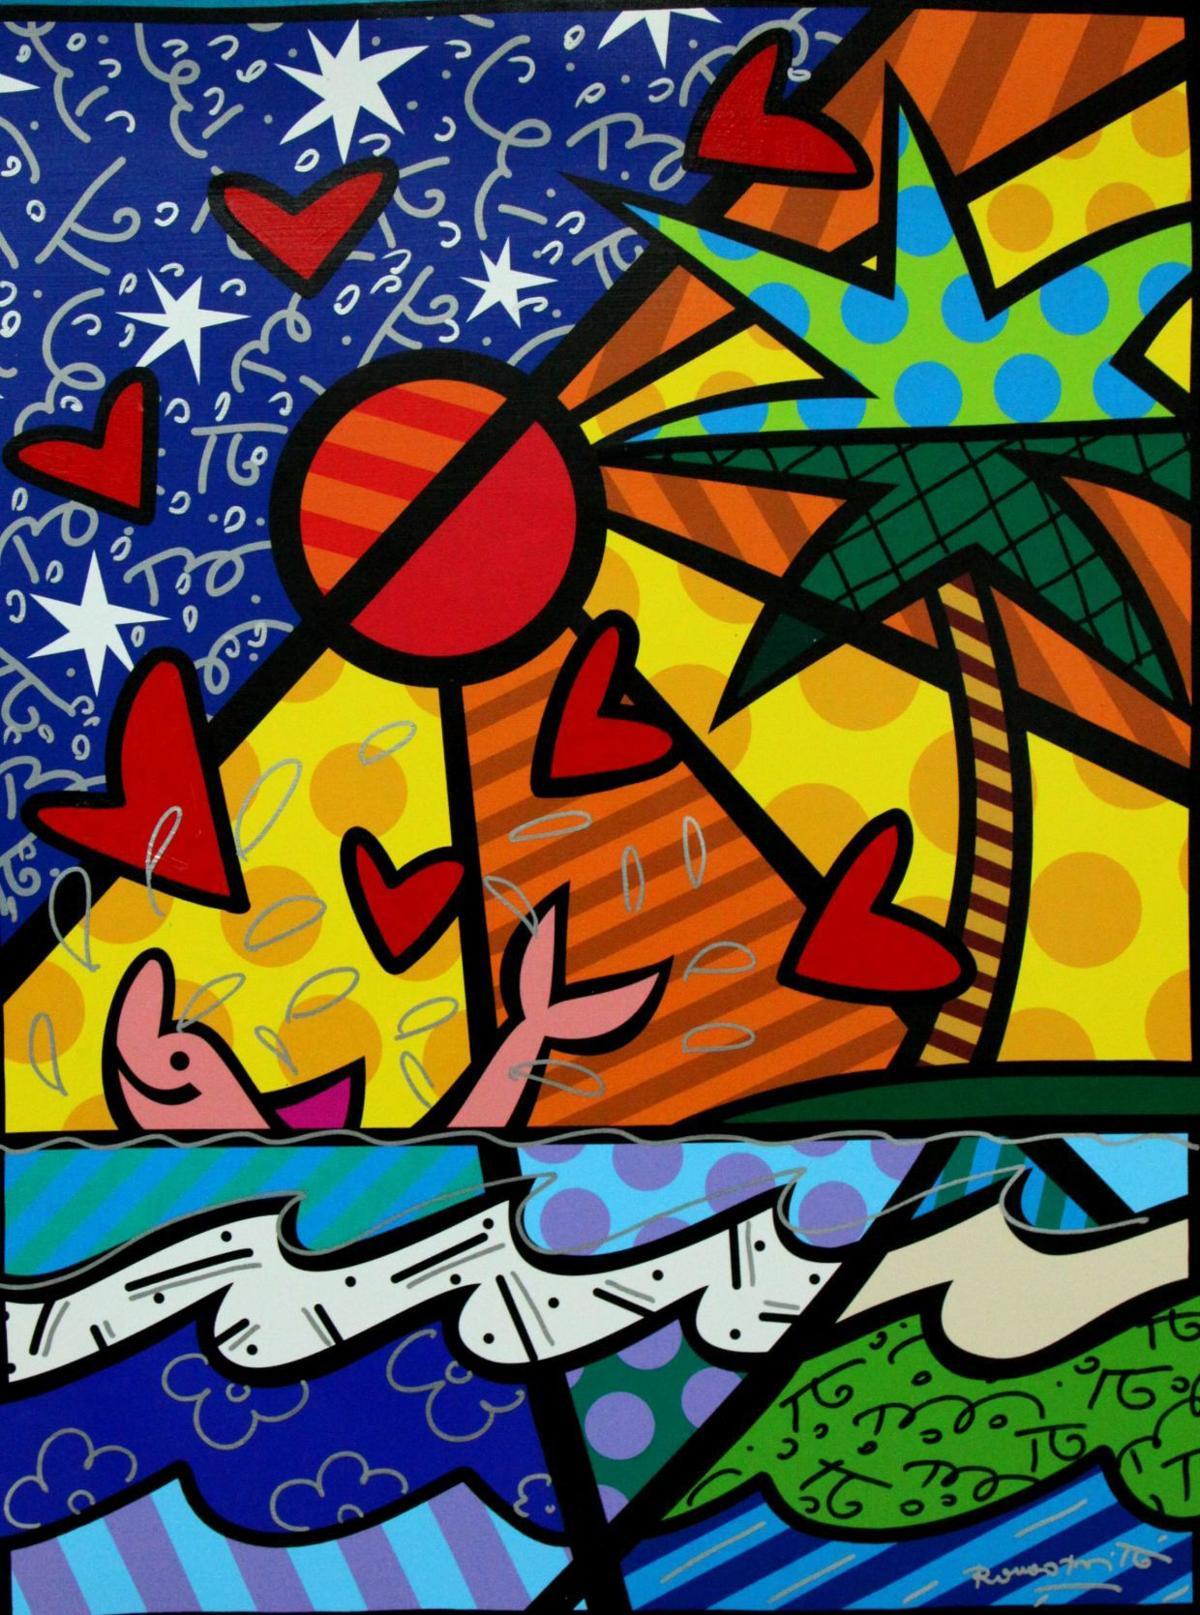 Neo-pop artist Romero Britto to exhibit at Ocean Galleries in Stone Harbor | Shore News Today | pressofatlanticcity.com